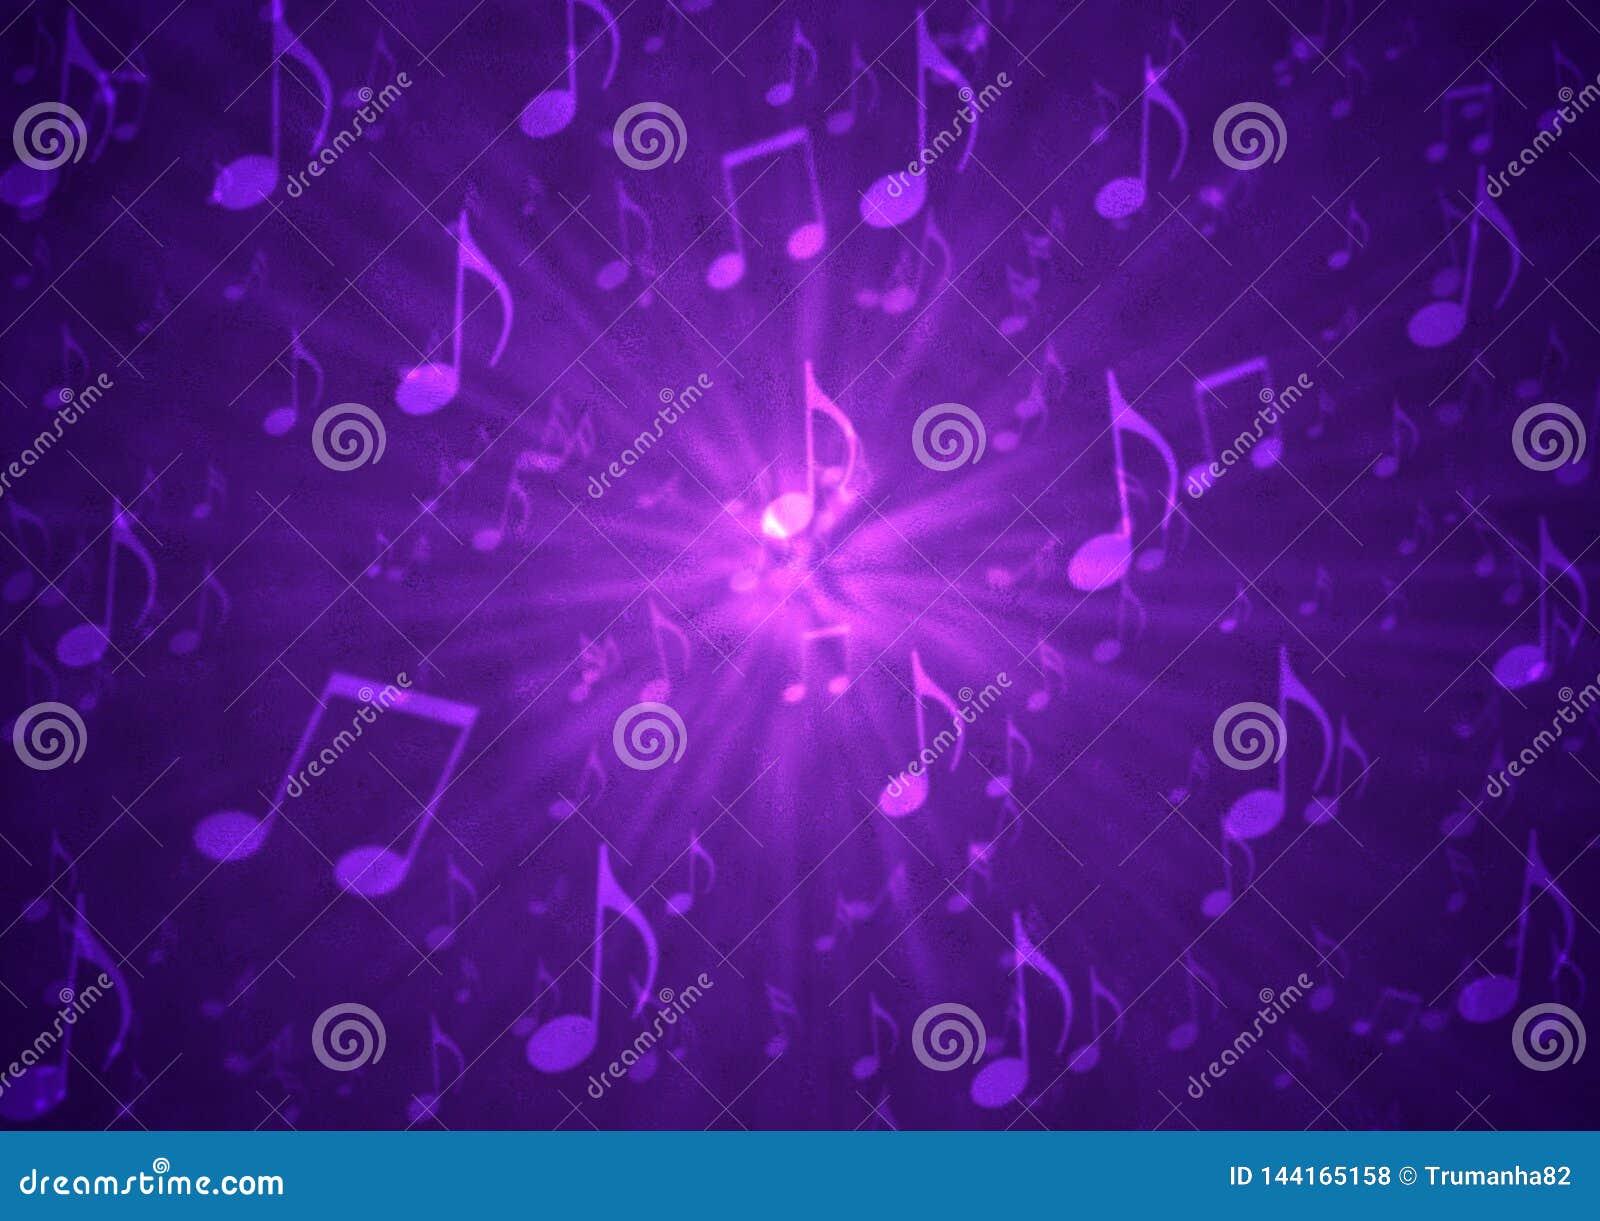 Abstract Music Notes Blast in Blurry Grungy Dark Purple Background